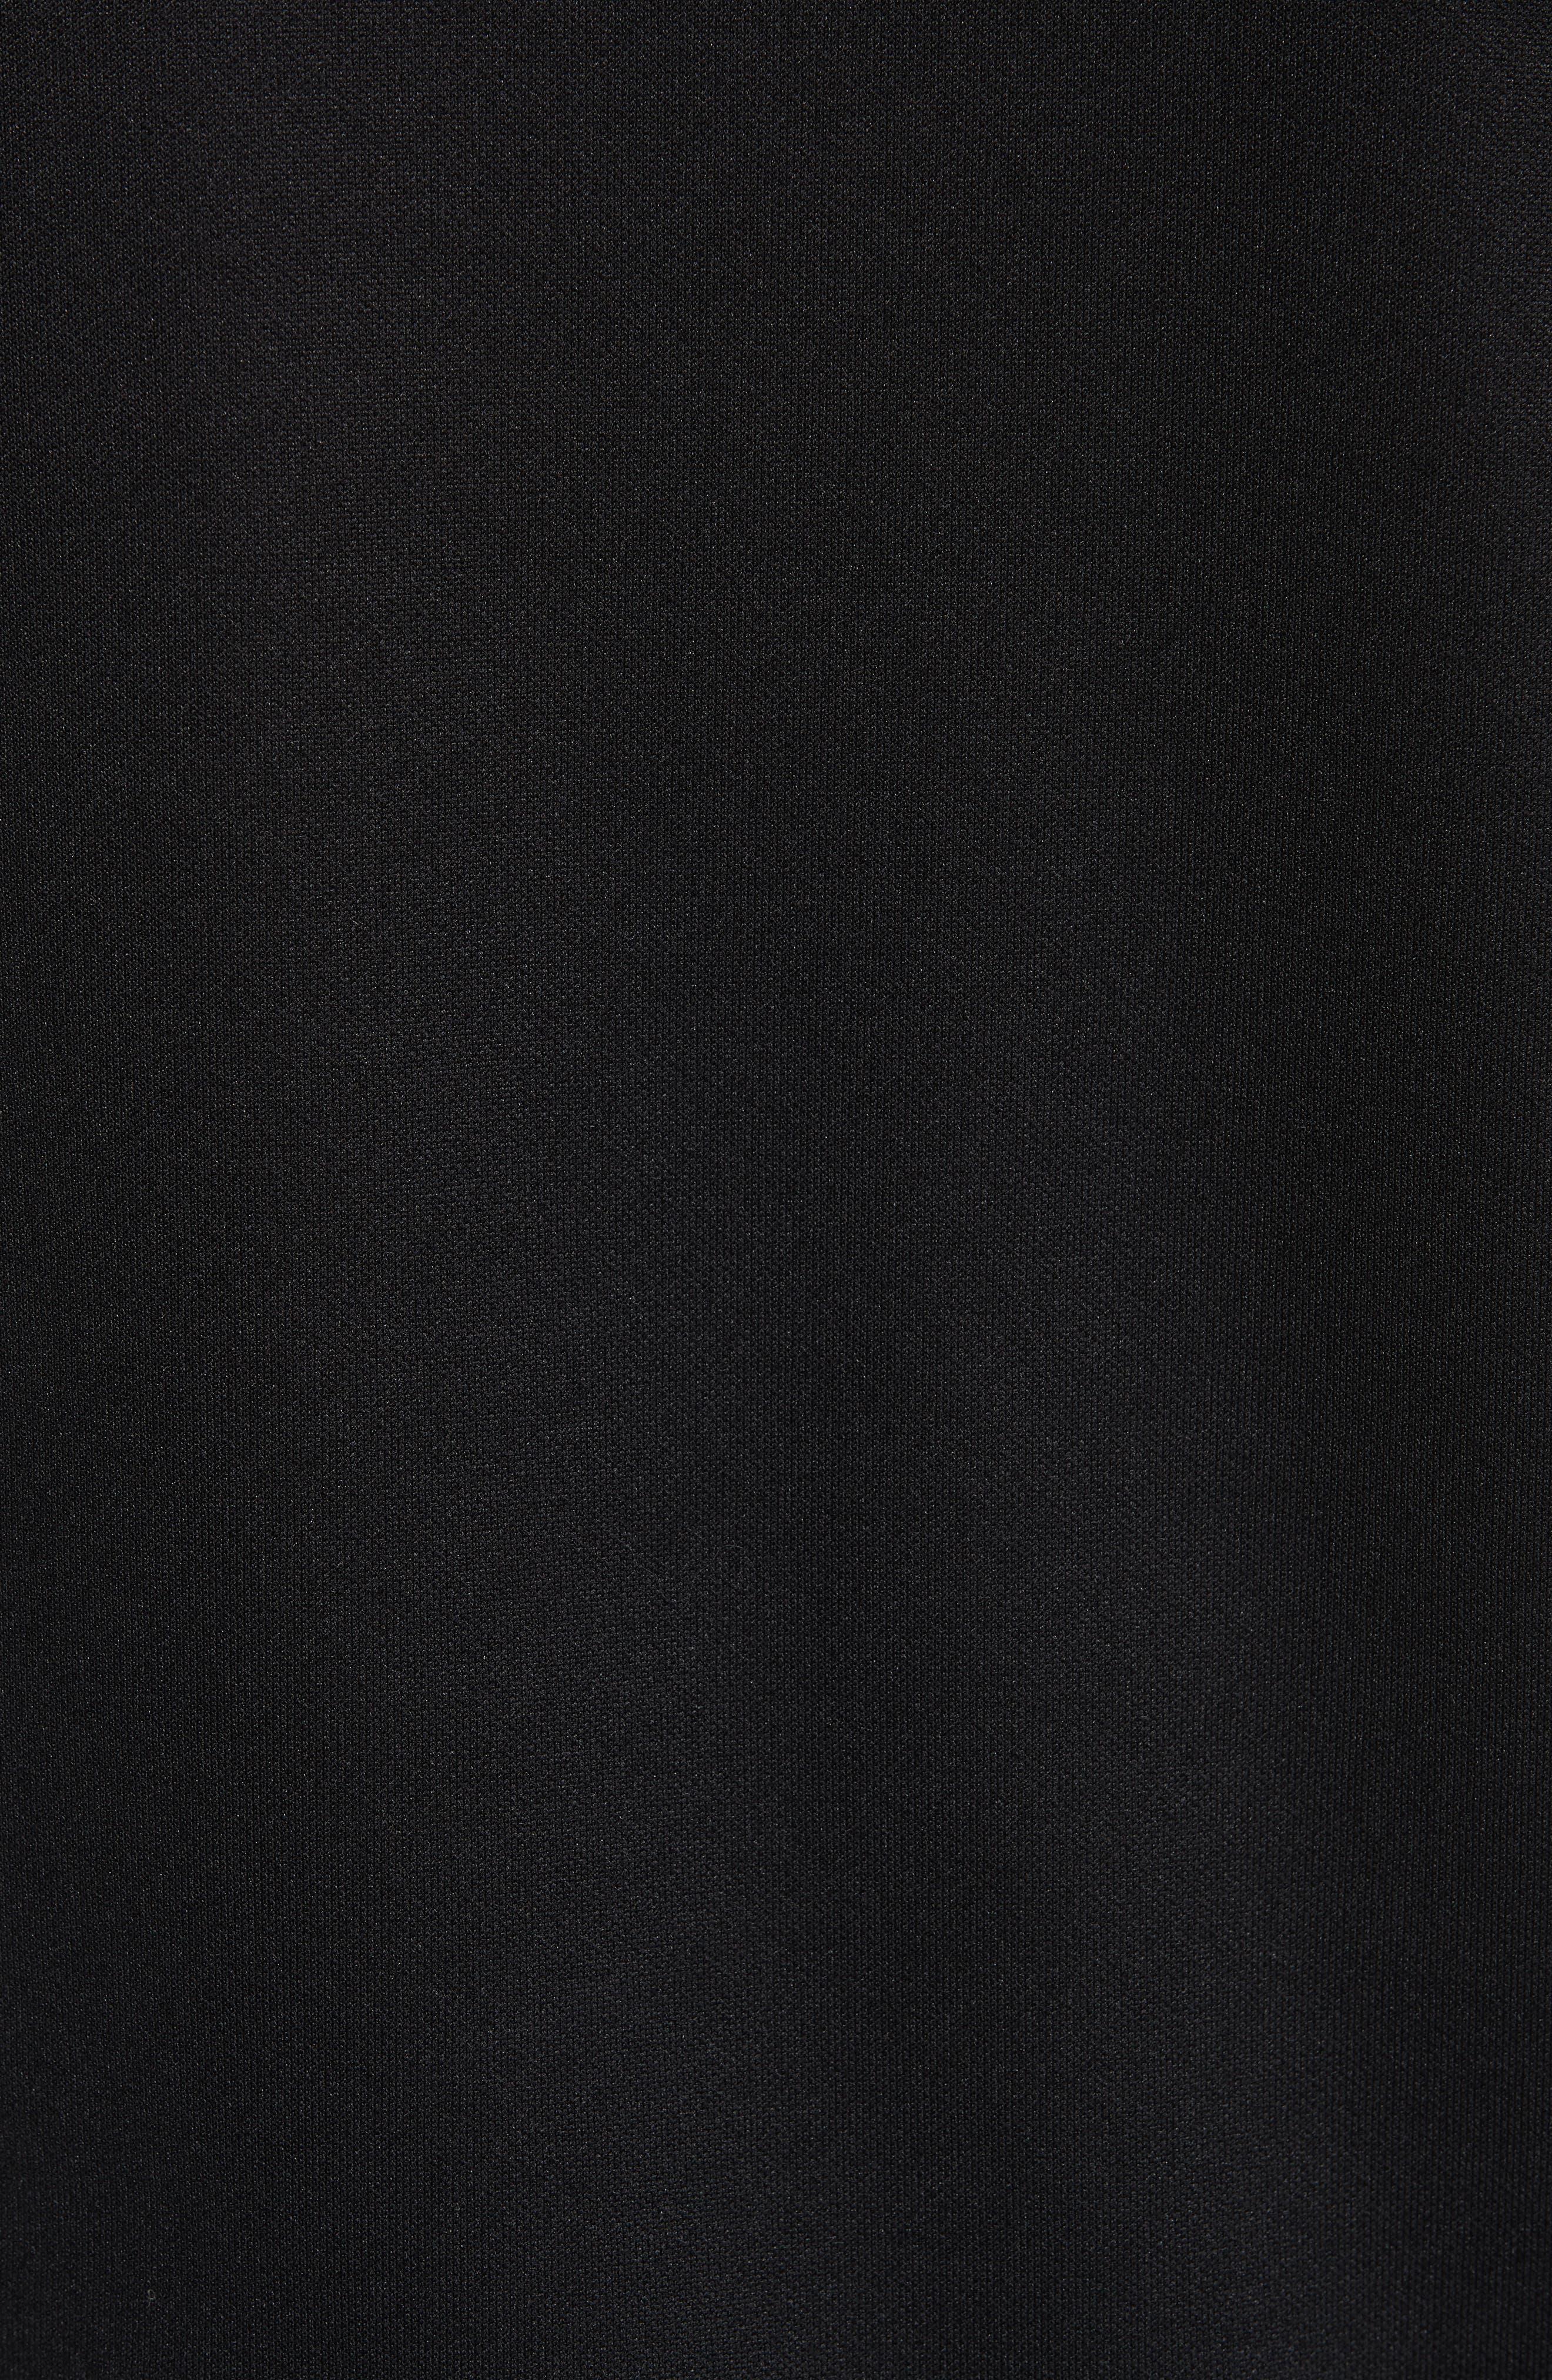 HELMUT LANG,                             Sport Stripe Print Sweatshirt,                             Alternate thumbnail 5, color,                             BLACK AND WHITE